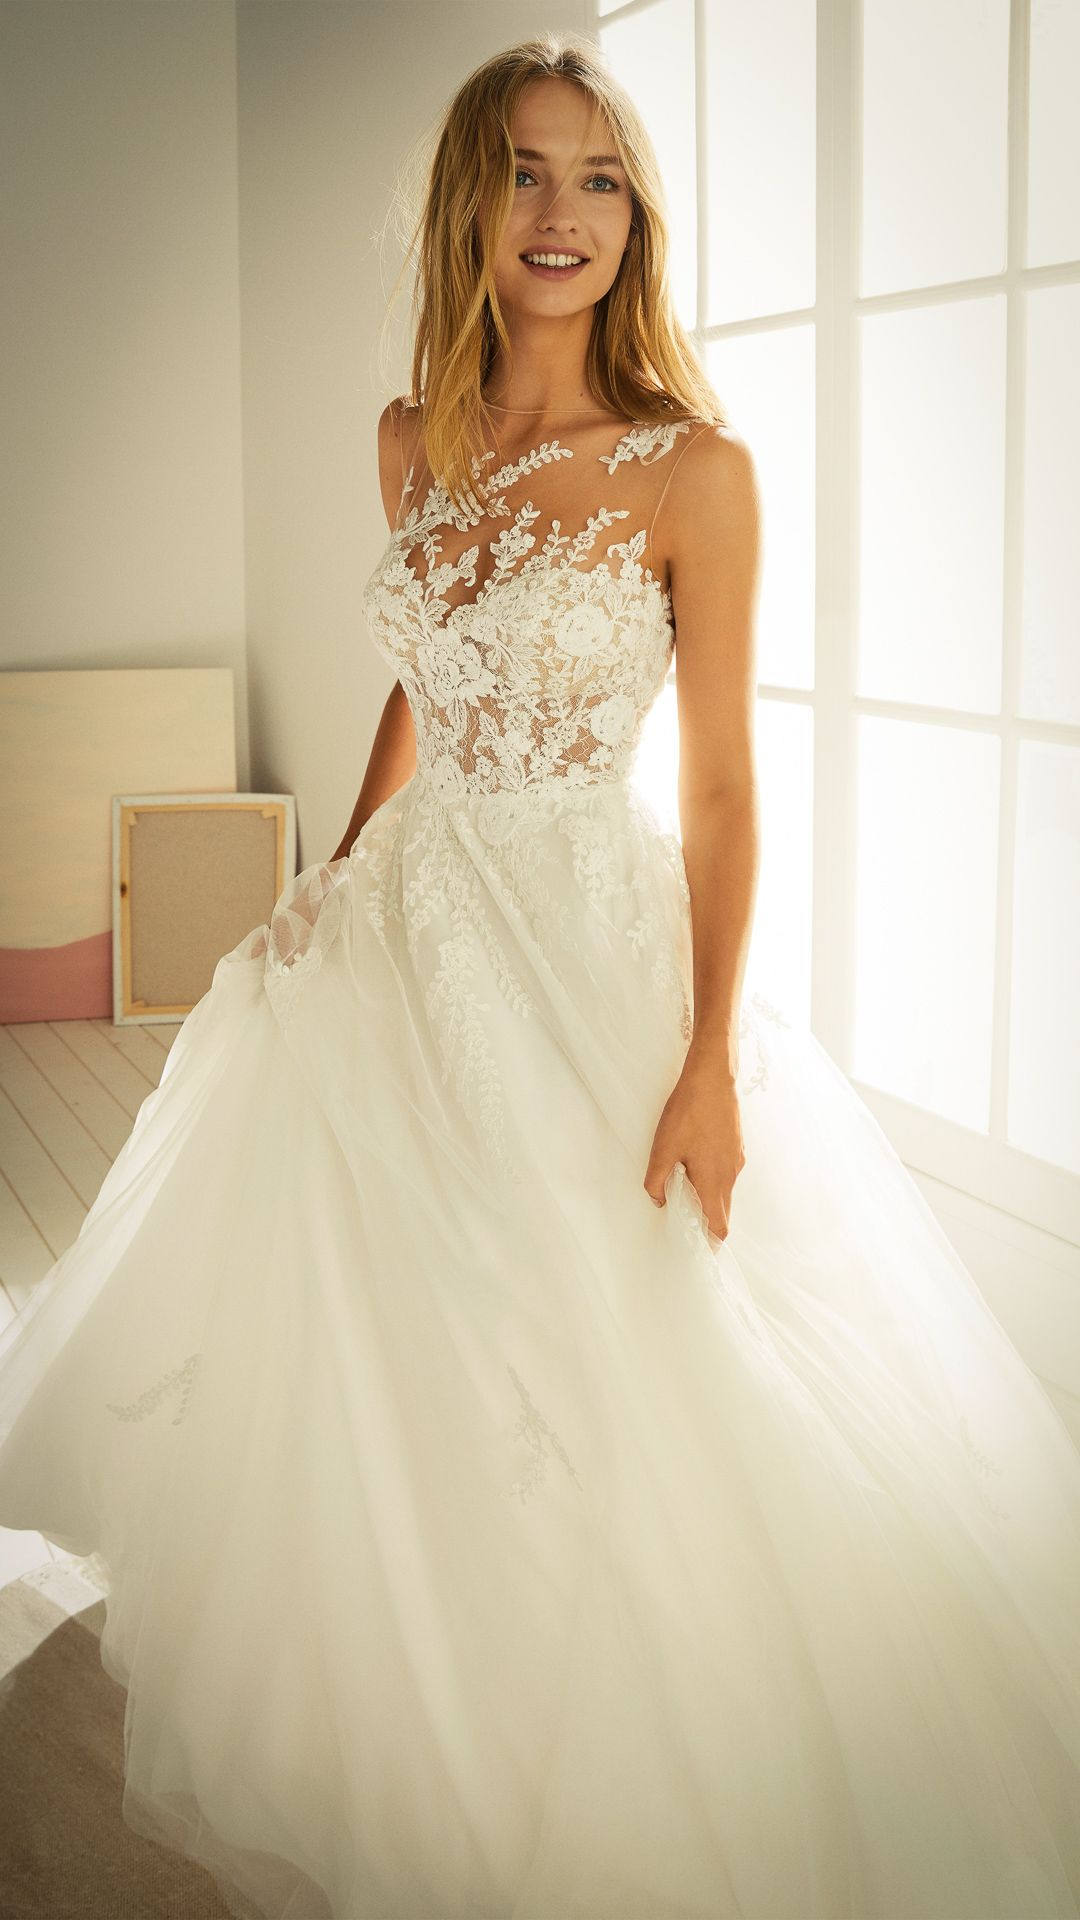 Hochzeitskleider 11 White One Kollektion Modell: OROPESA-D-11